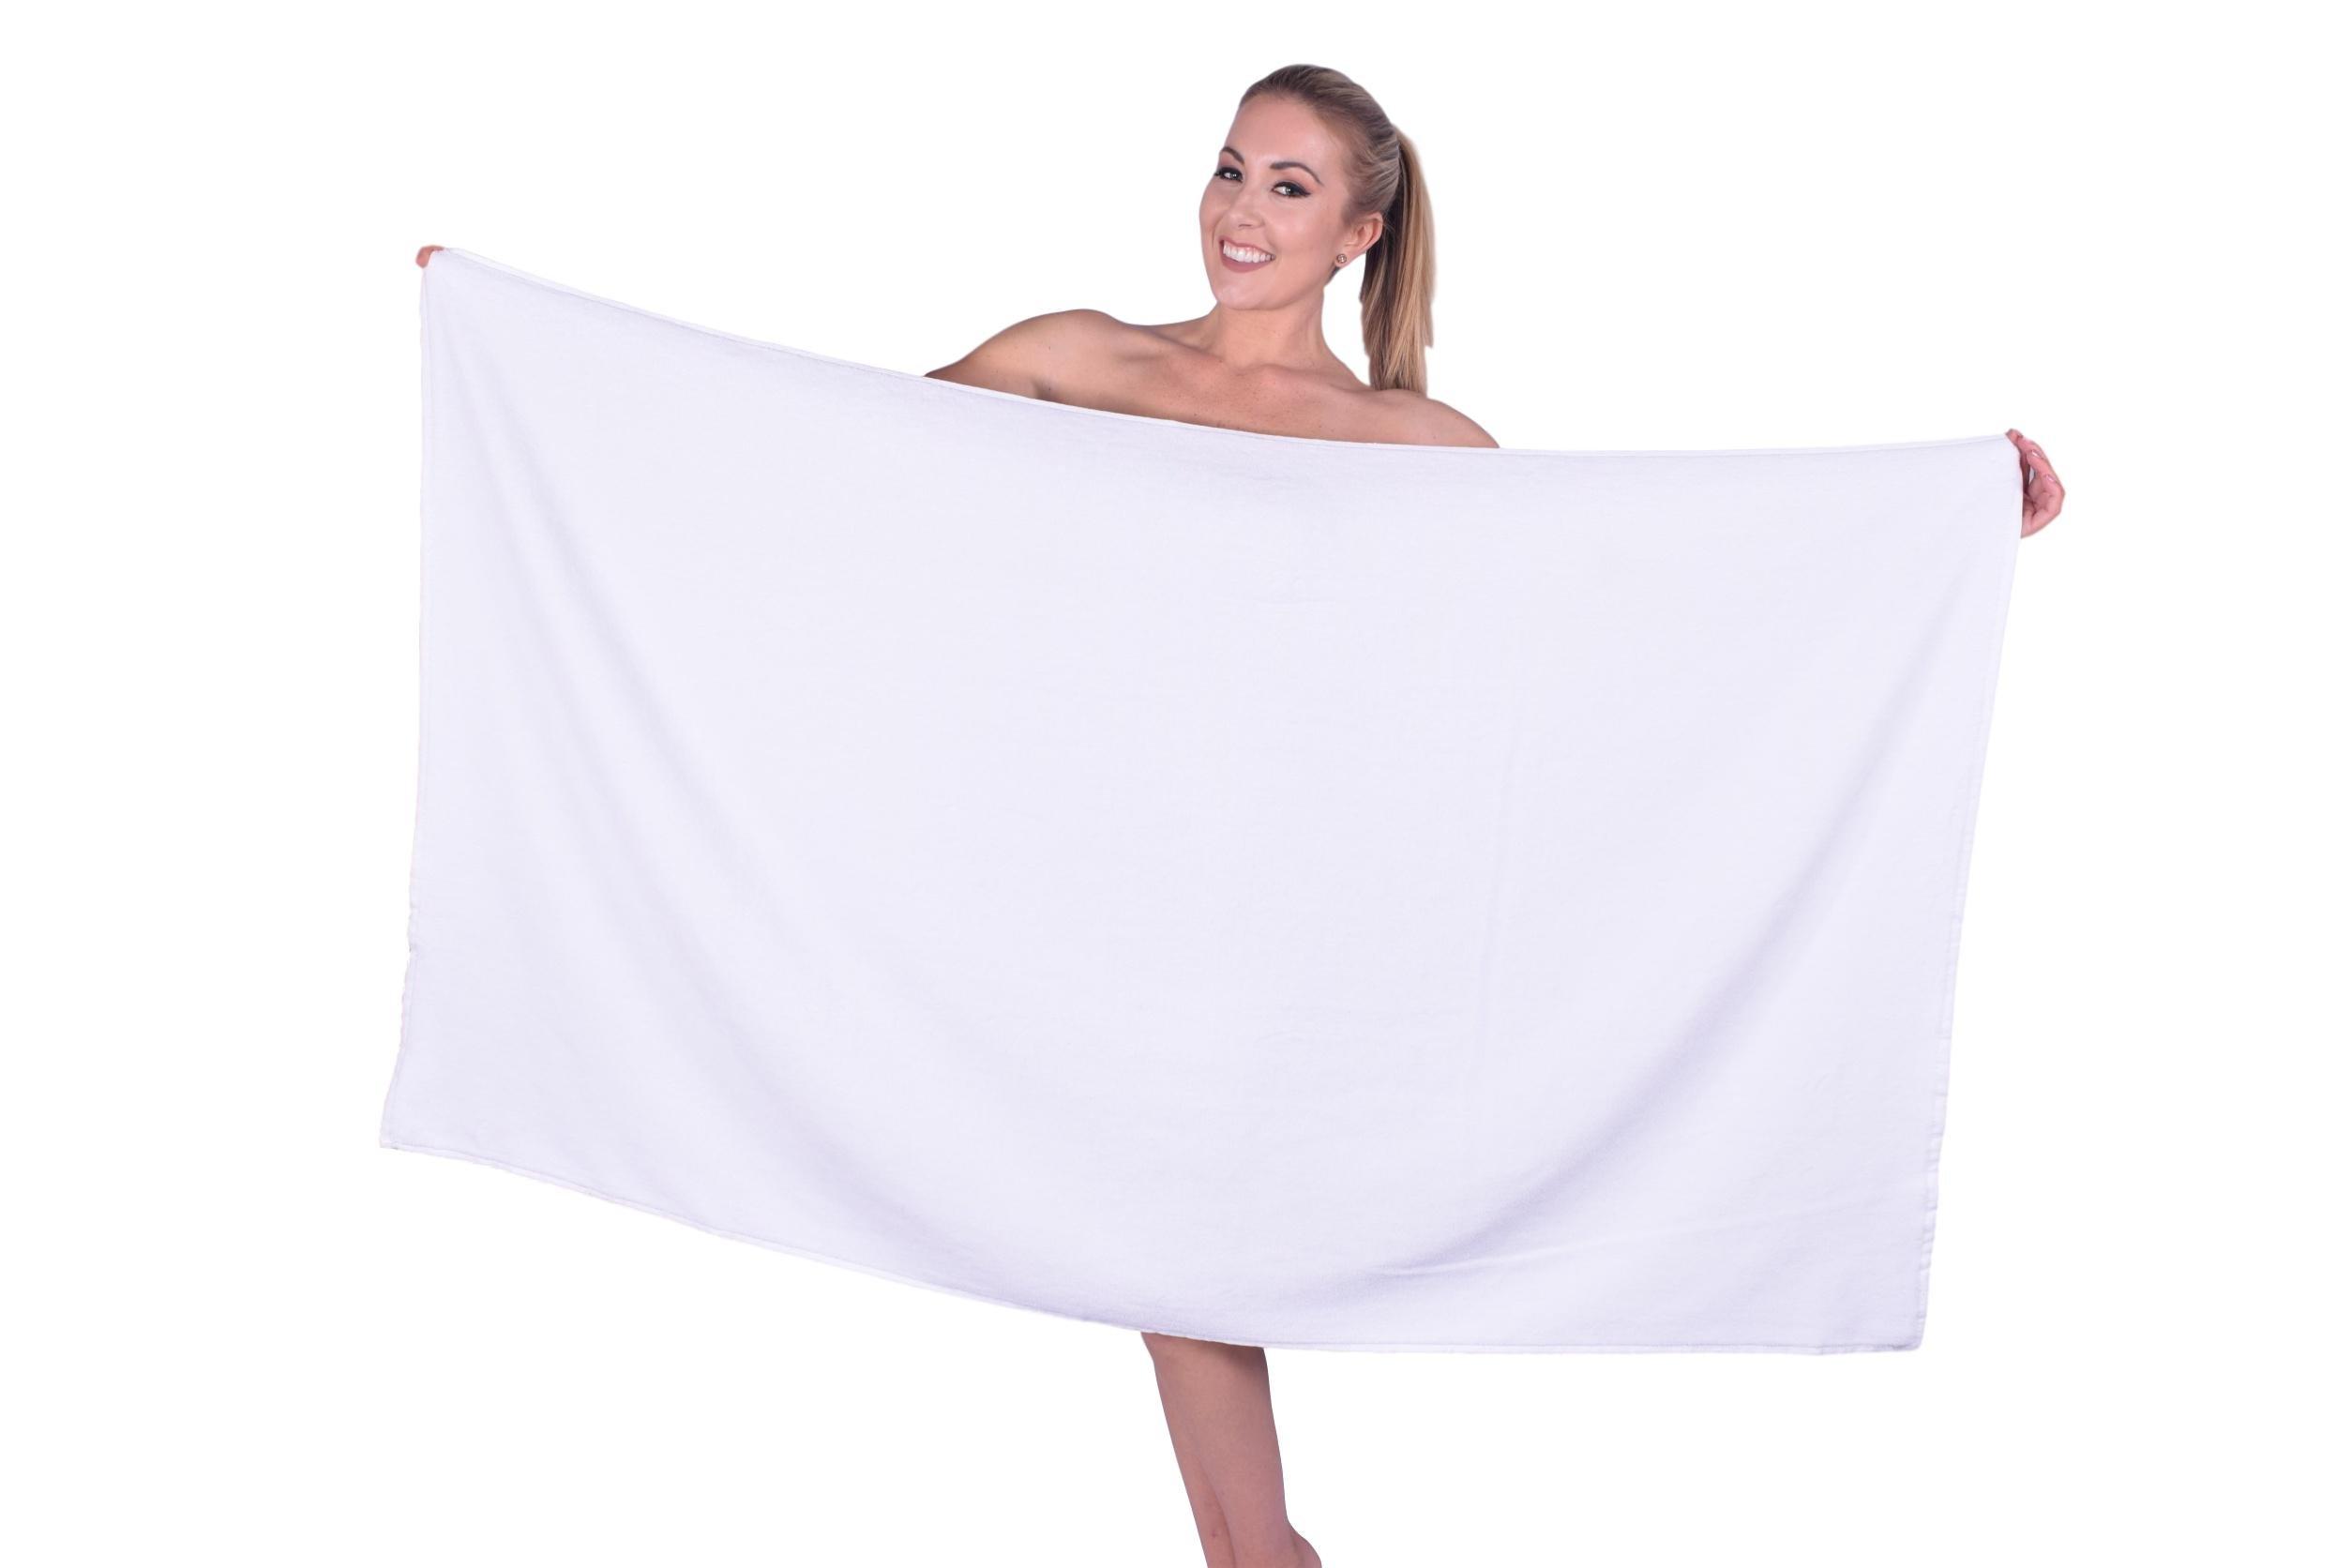 Puffy Cotton Luxury Plush Velour Large Bath Towel (Hotel, Spa, Bath) - Beach Towel, Super Soft and Absorbent (White, 3)